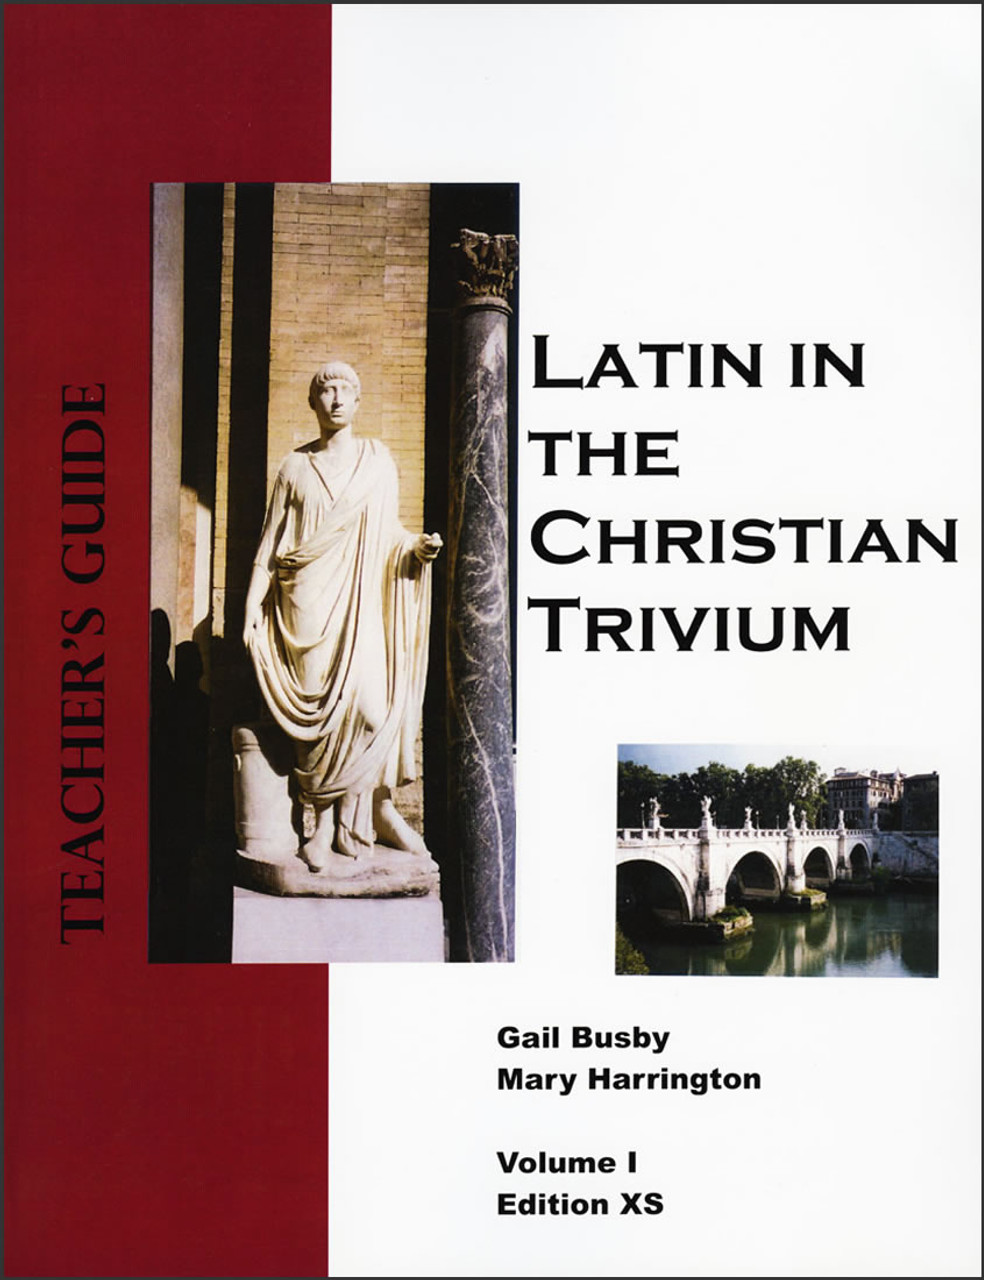 Latin in the Christian Trivium: Volume 1 - Teacher's Guide